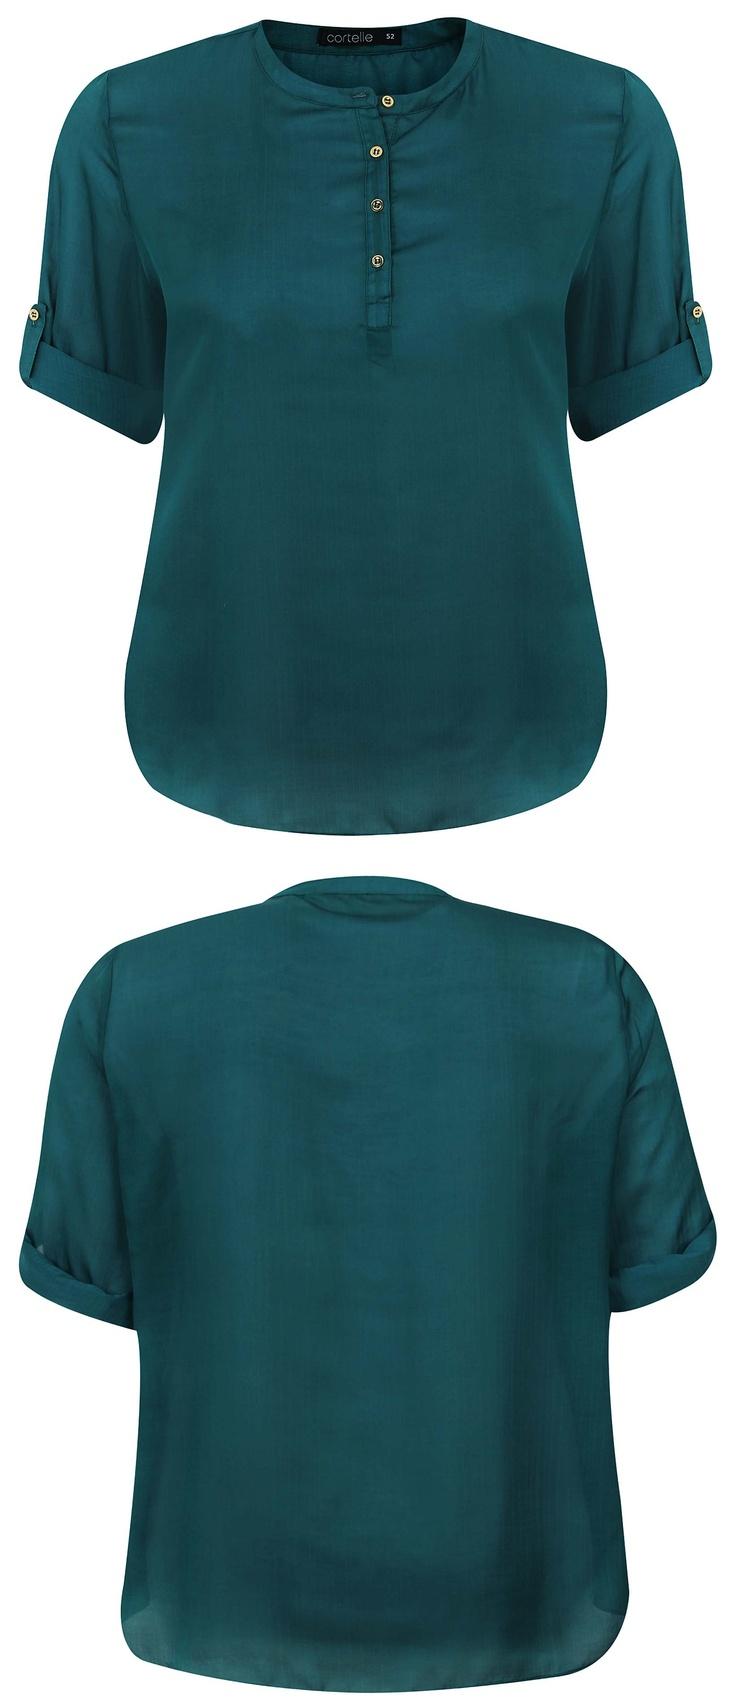 134 Best Blusas Images On Pinterest African Fashion Style Blouse Tendencies Tshirt Beach Kid Hitam Xl Renner Blusa Plus Size Manga 3 4